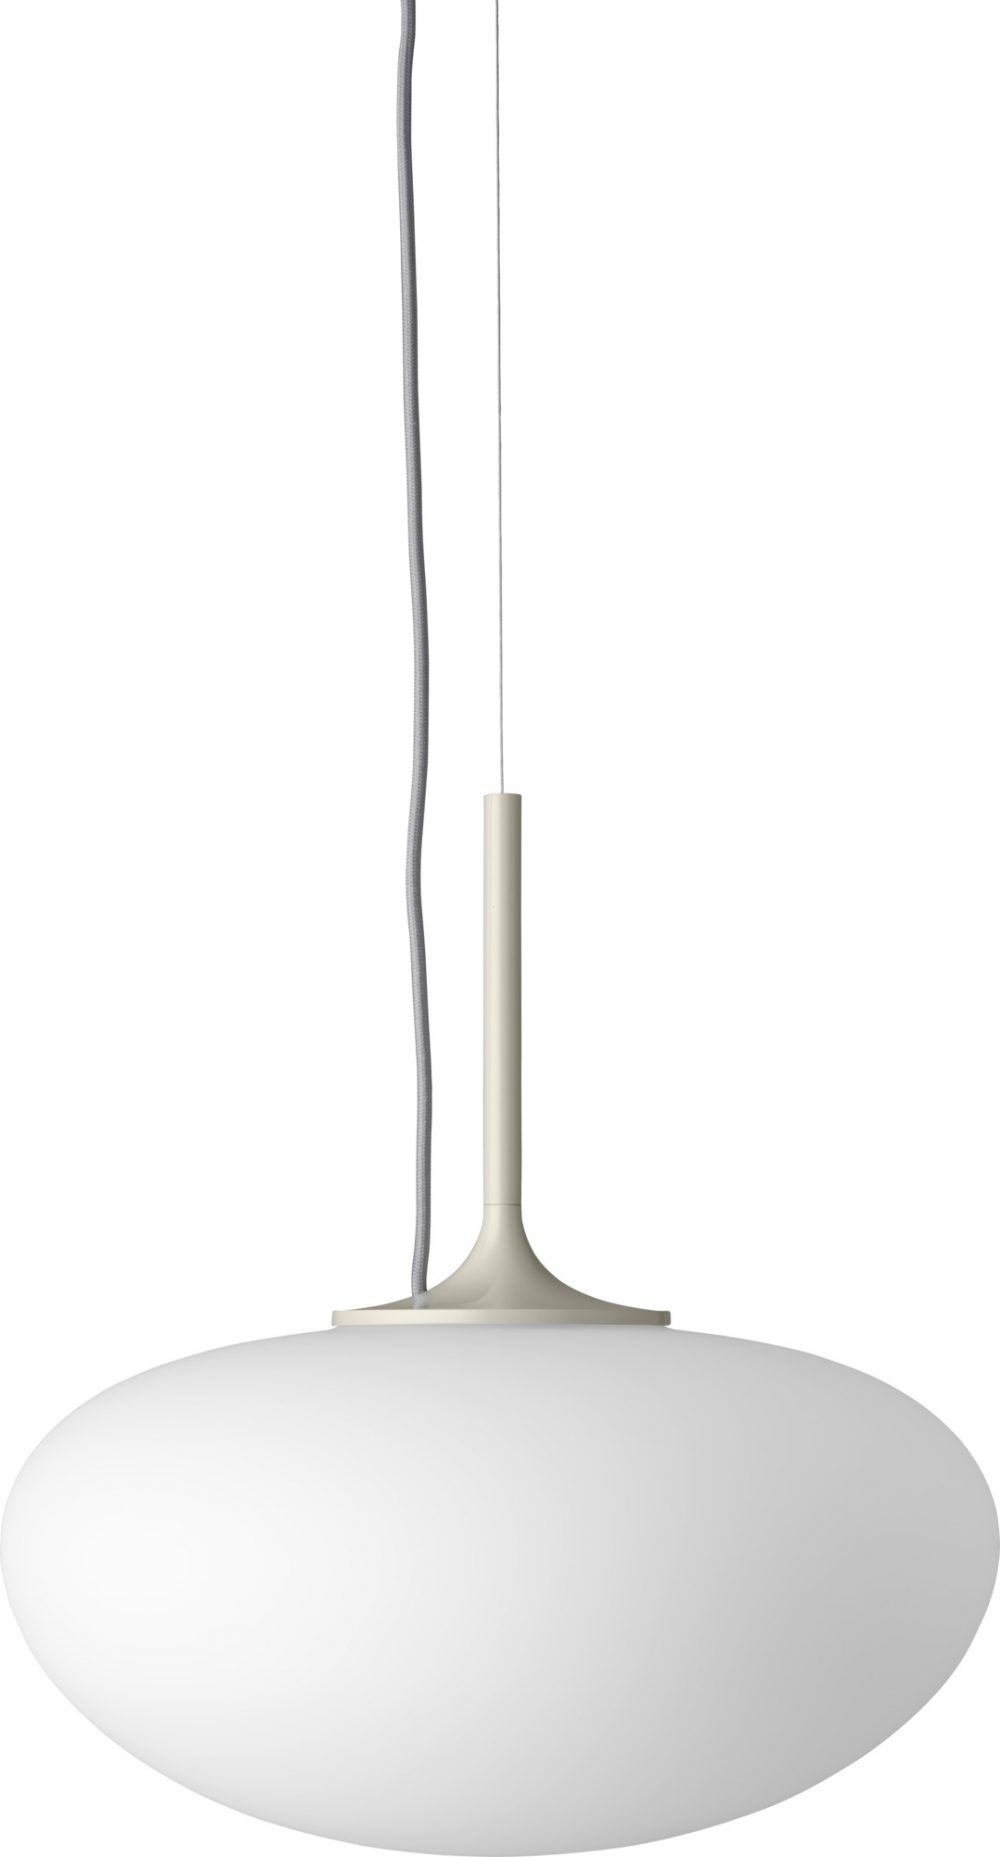 Pendel loftslampe Stemlite Bill Curry Gubi